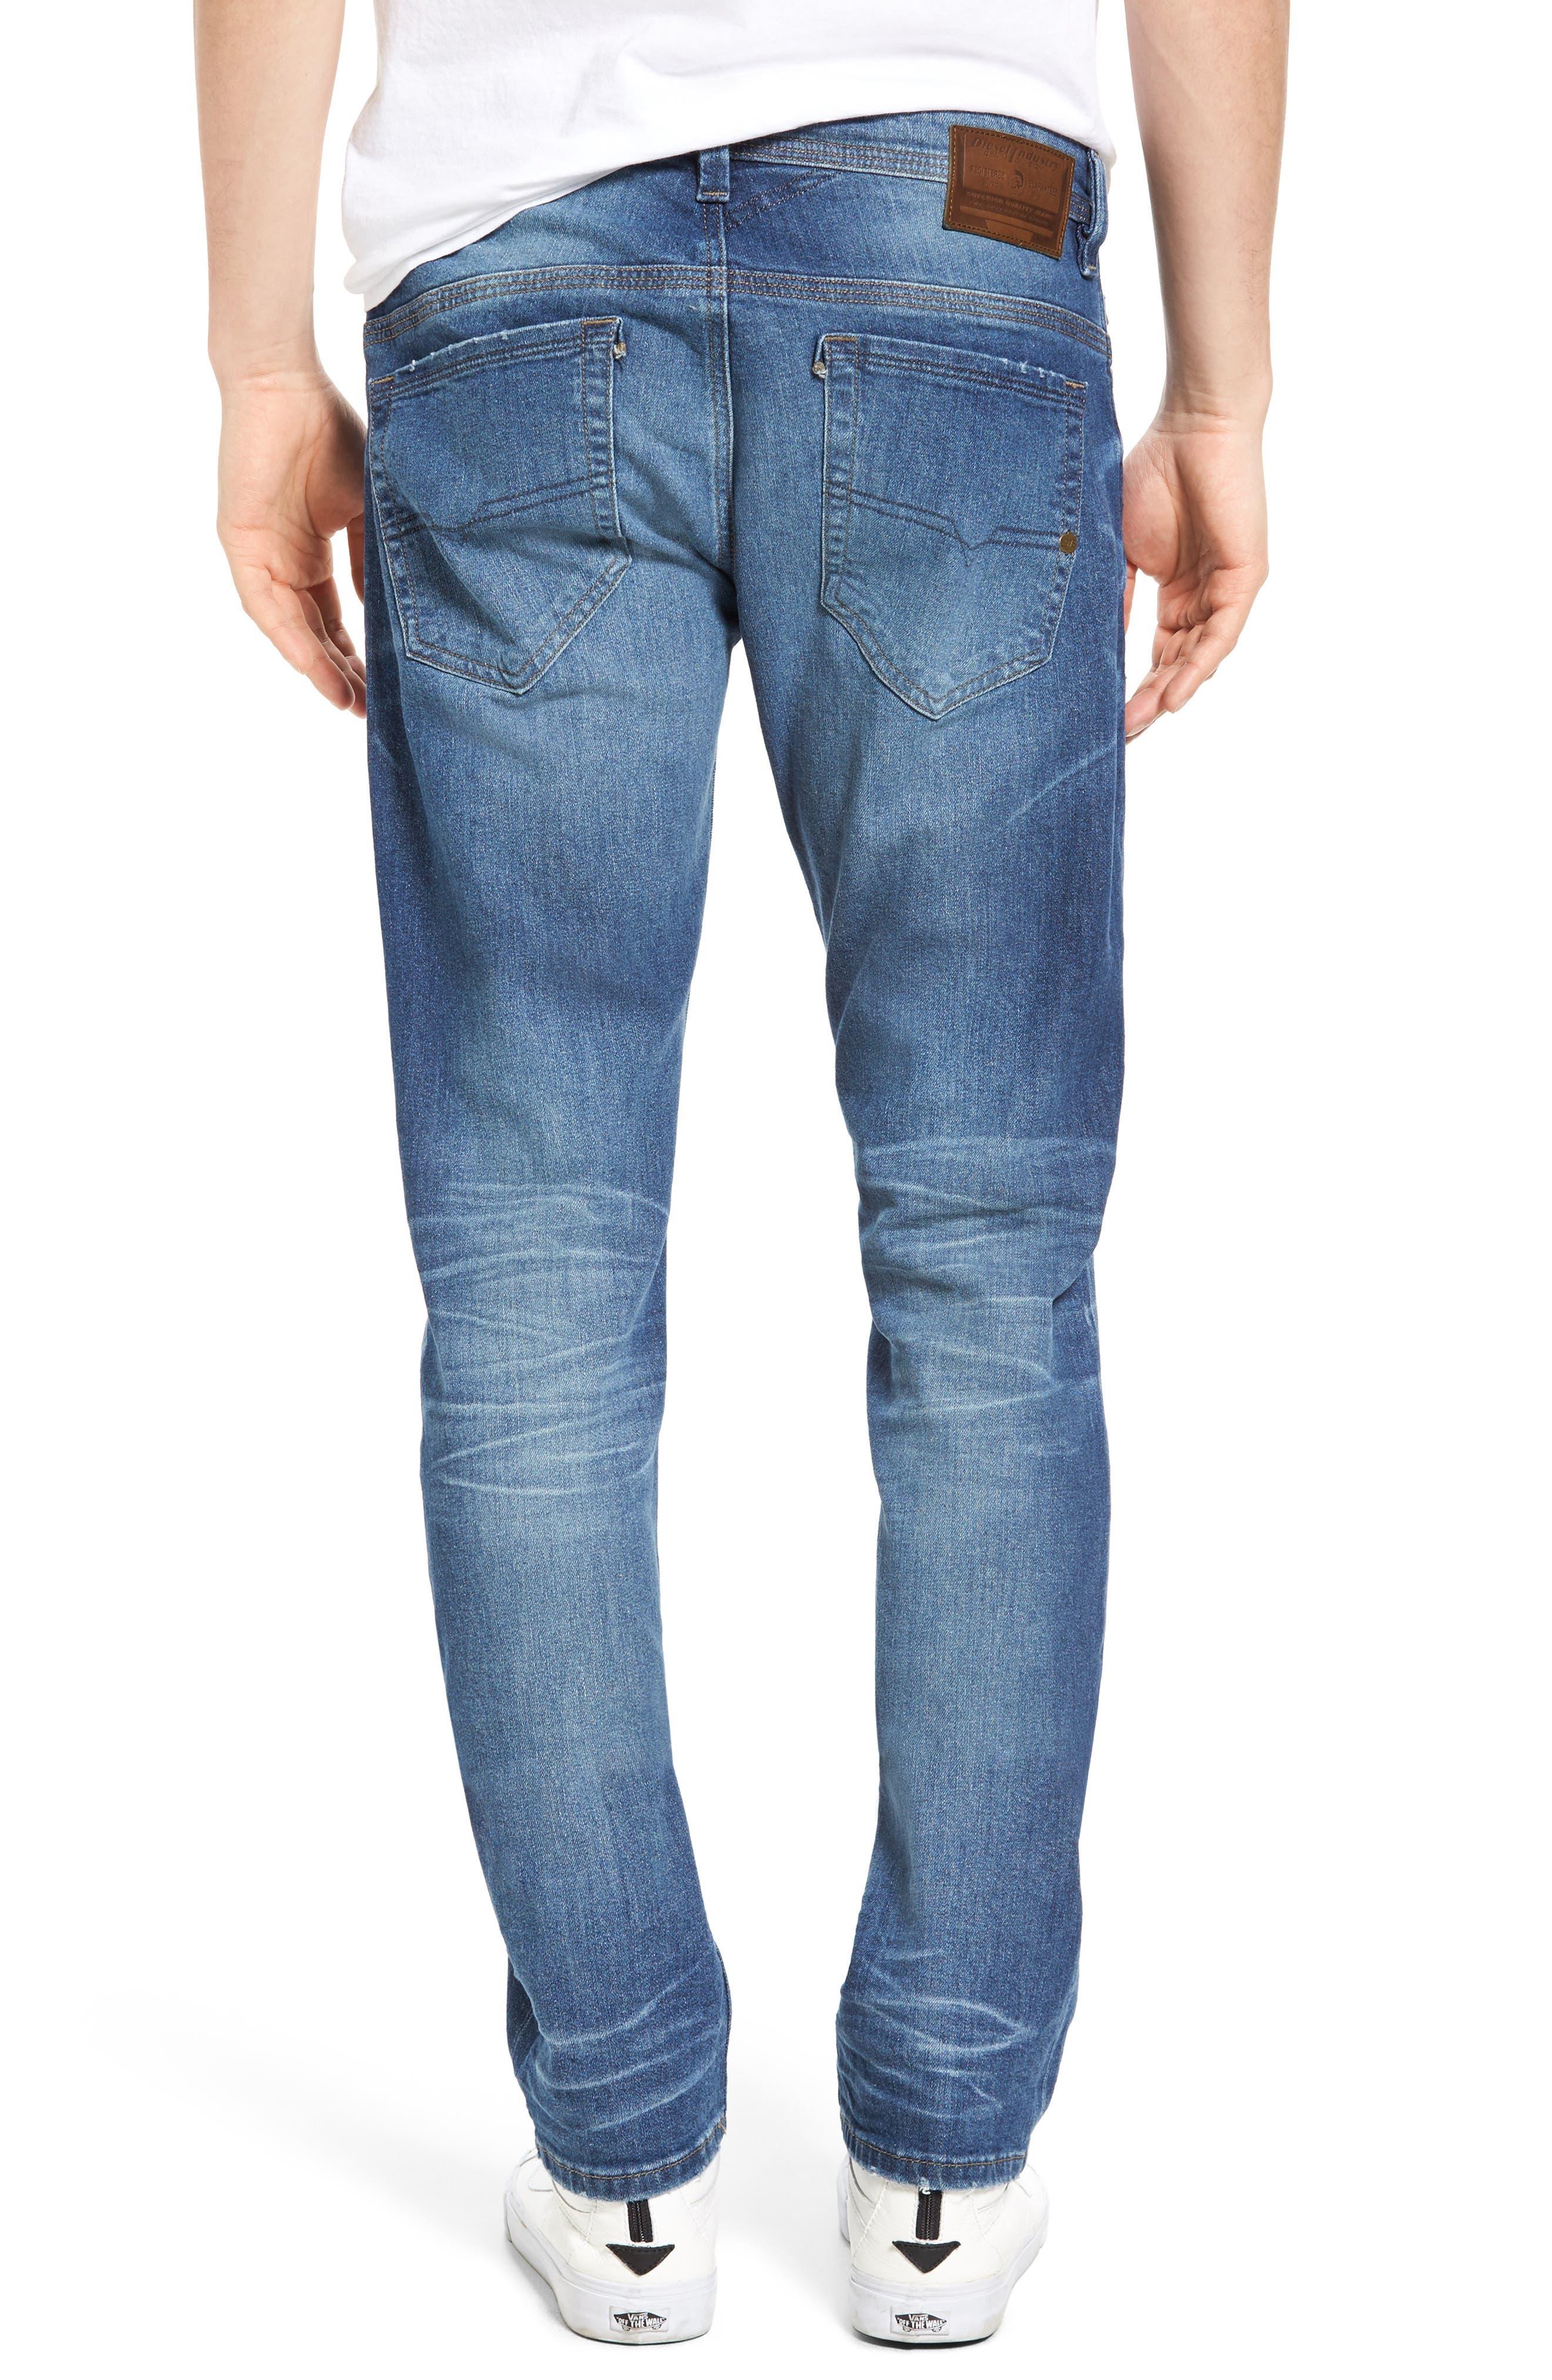 Thavar Skinny Fit Jeans,                             Alternate thumbnail 2, color,                             400